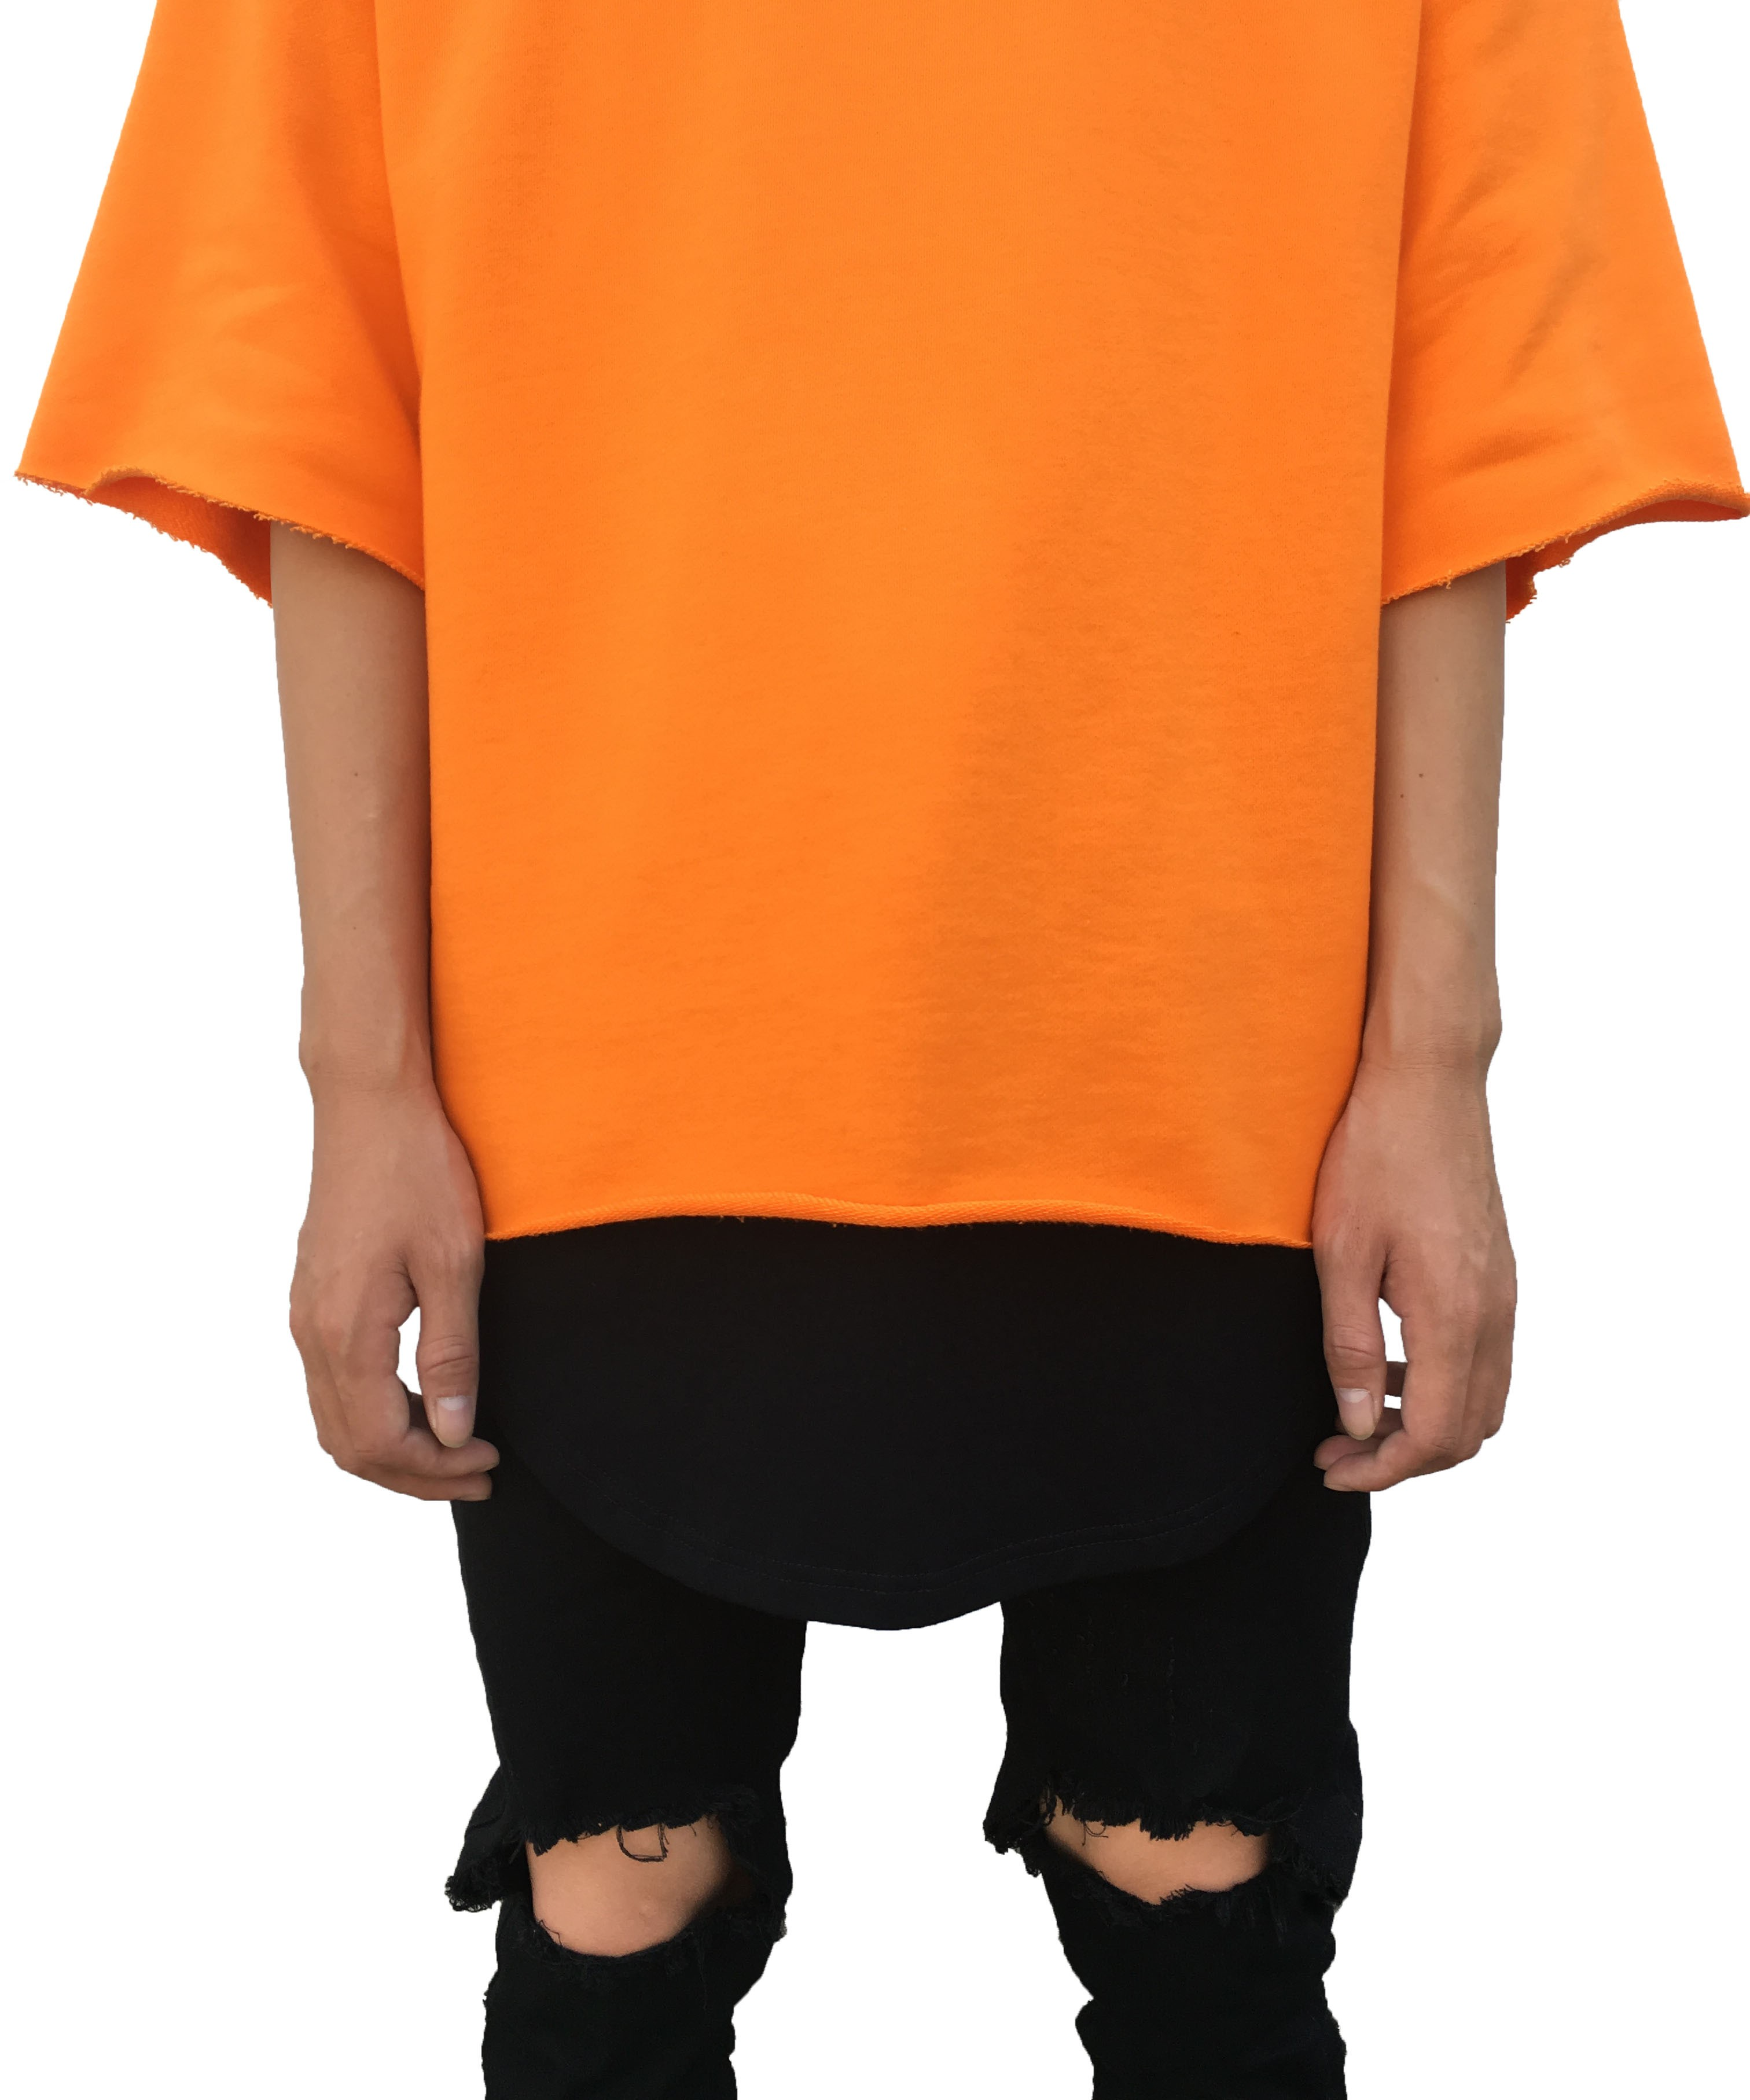 RAW SHORT SLEEVE SWEATER YELLOW | T Shirts | Ontario, Canada